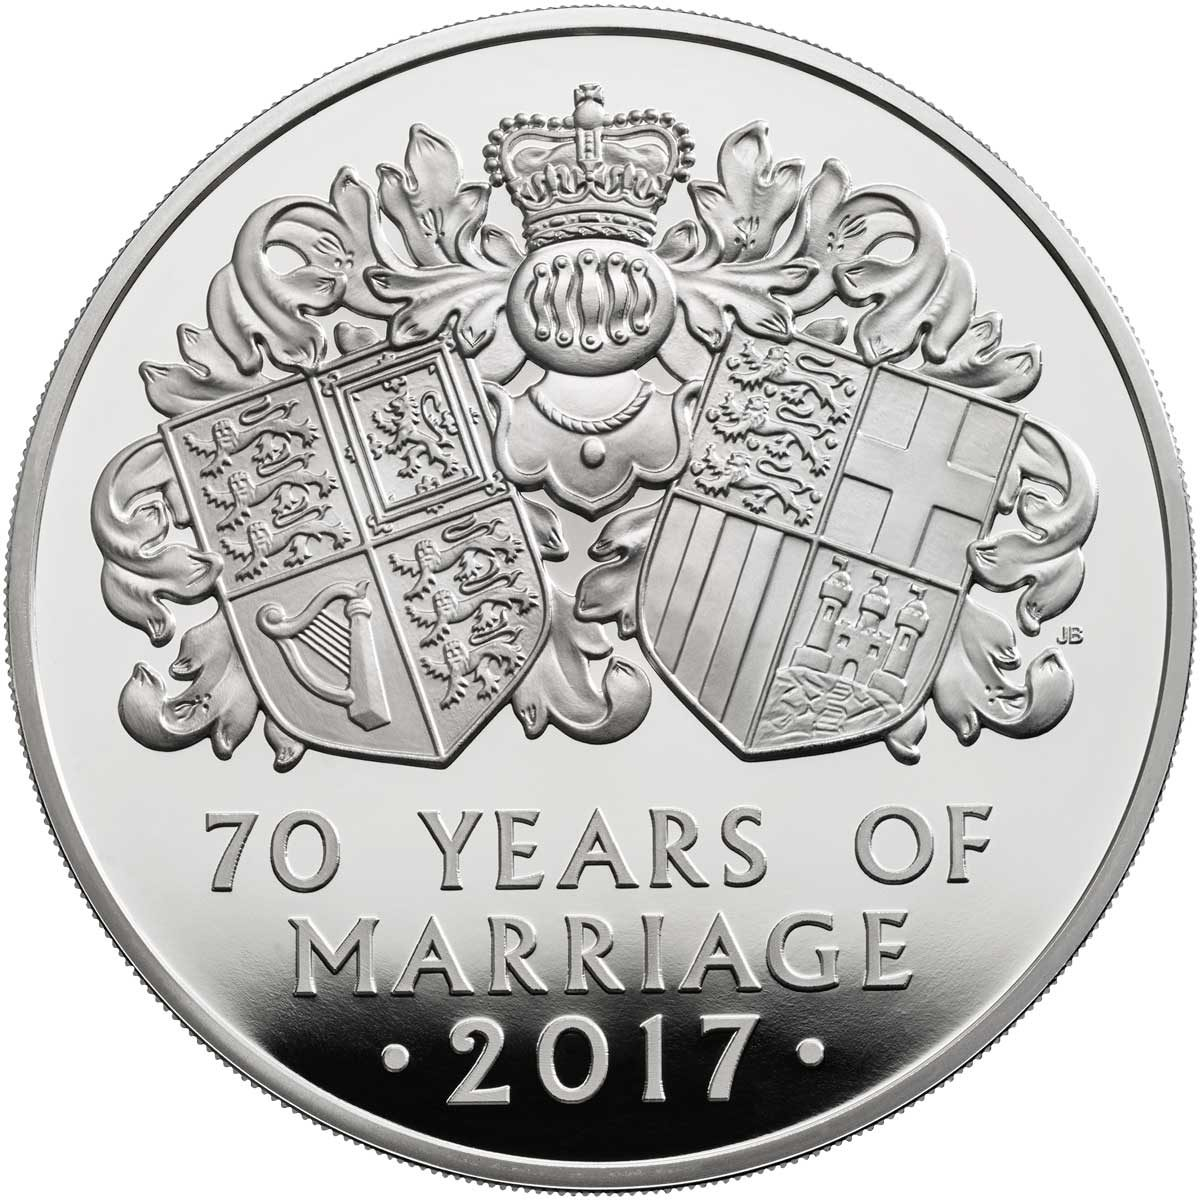 PLATINUM WEDDING 2017 UNITED KINGDOM 5OZ PROOF SILVER